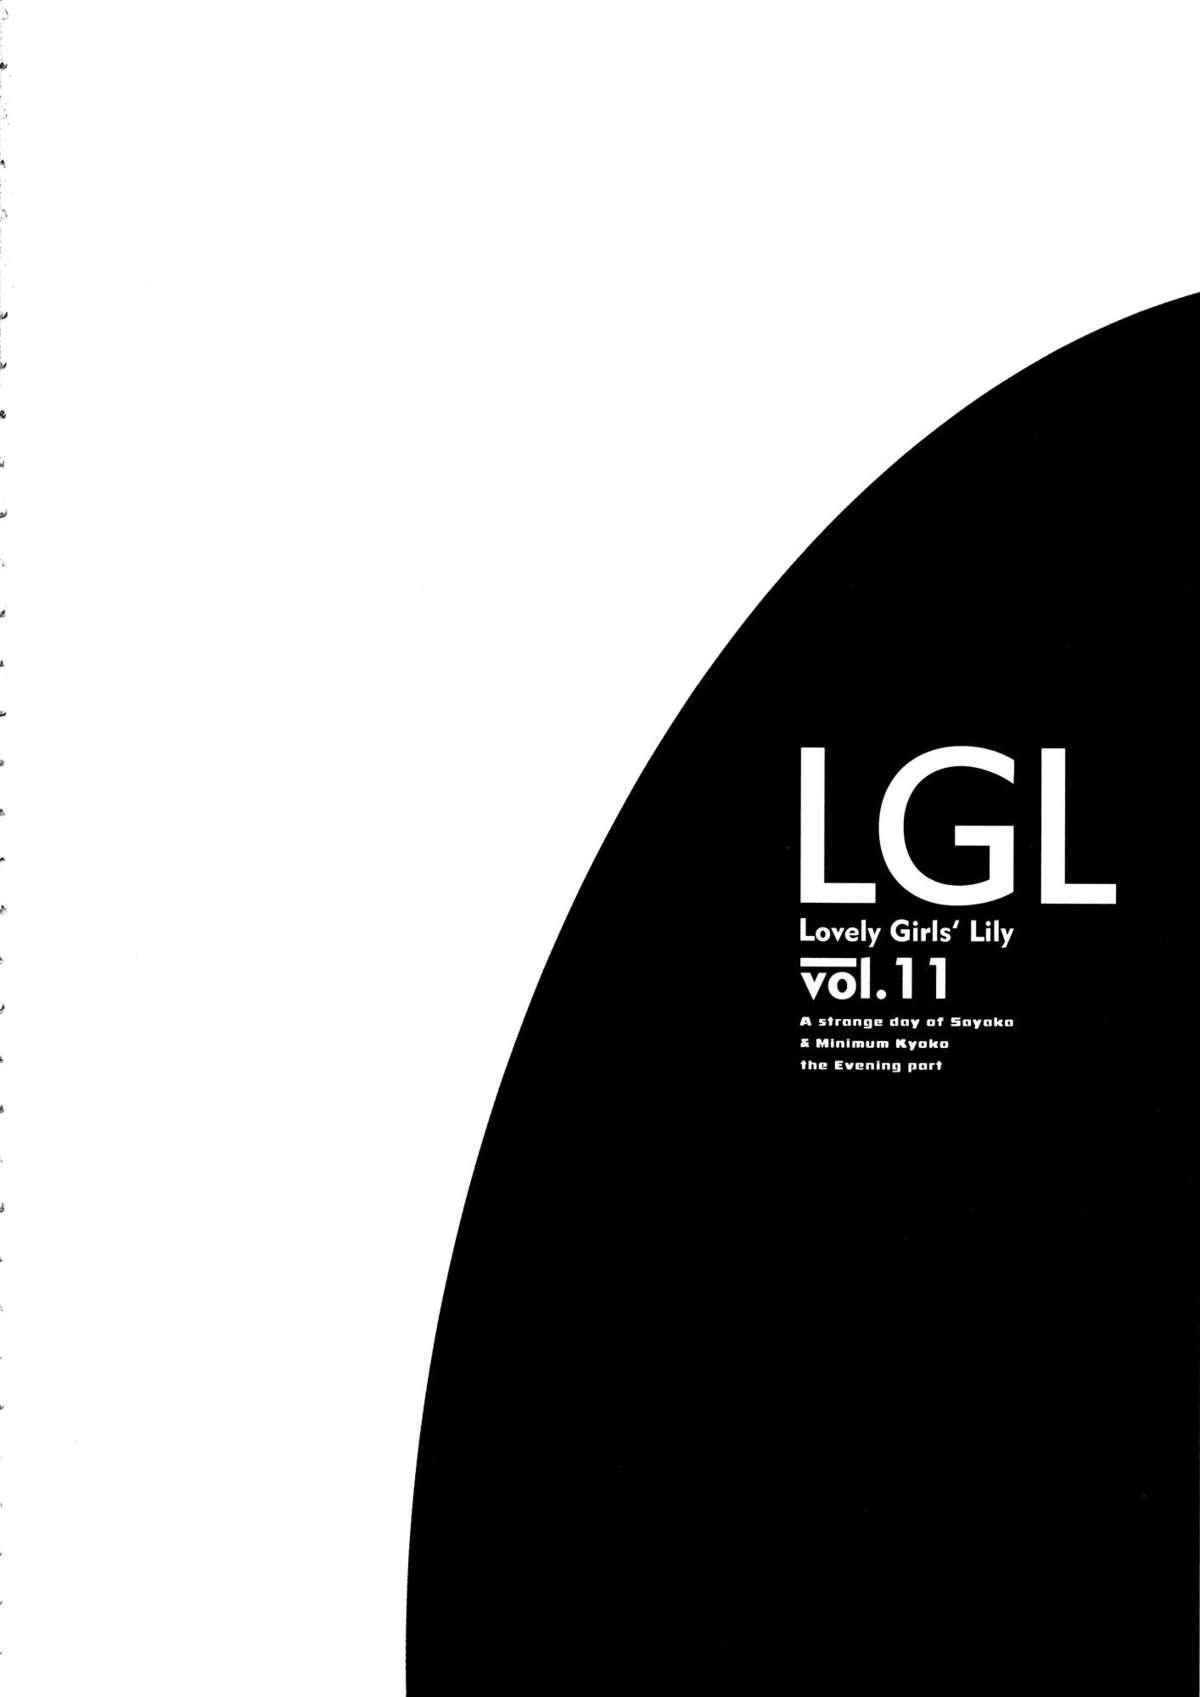 Lovely Girls' Lily Vol. 11 3